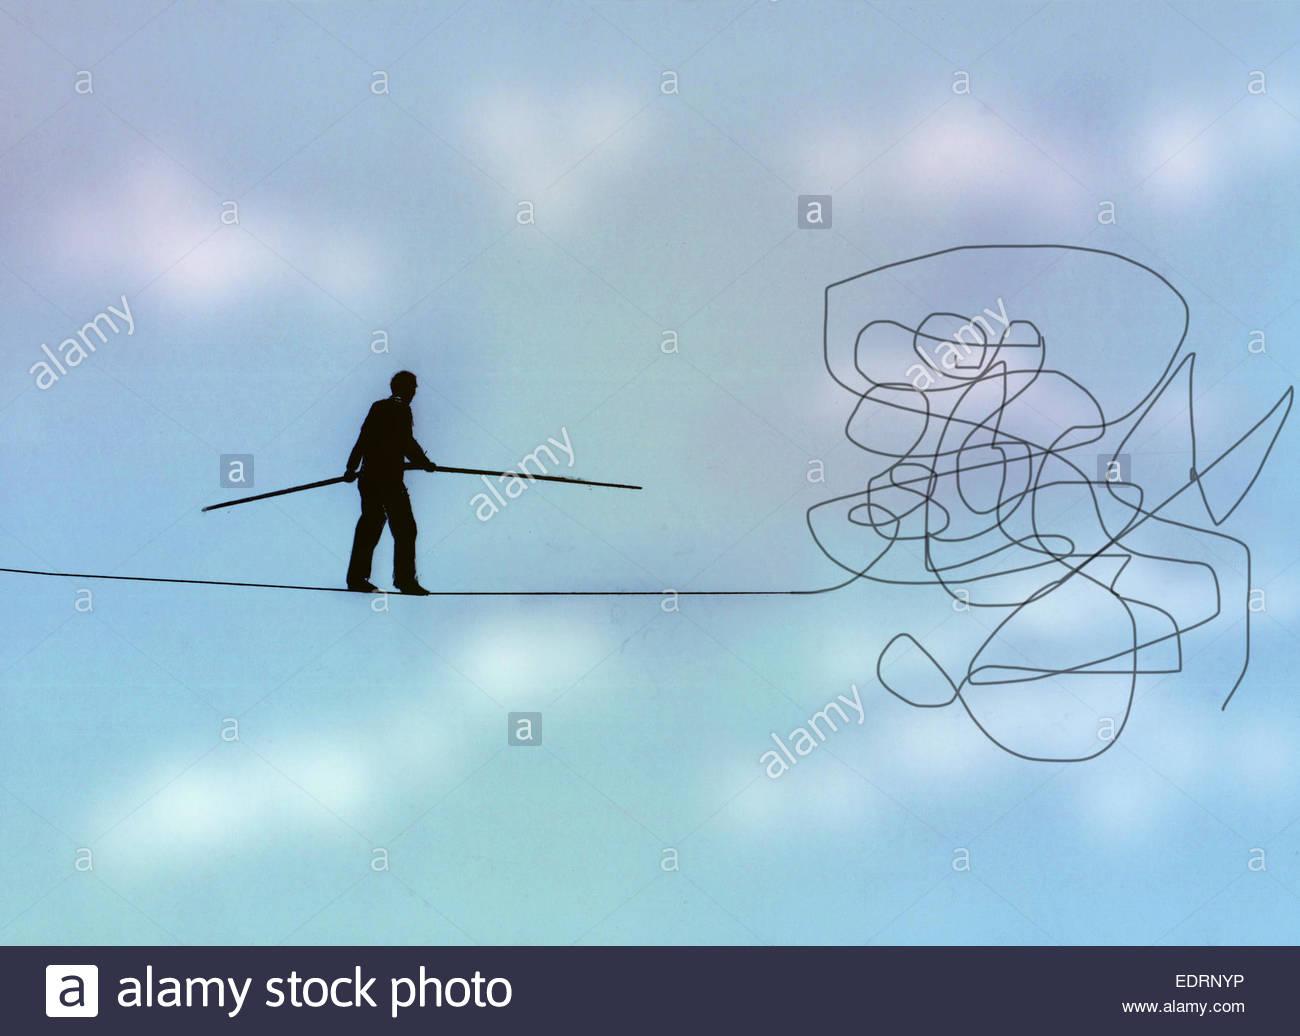 Man nähert sich Knoten auf verschlungenen Drahtseil Stockbild